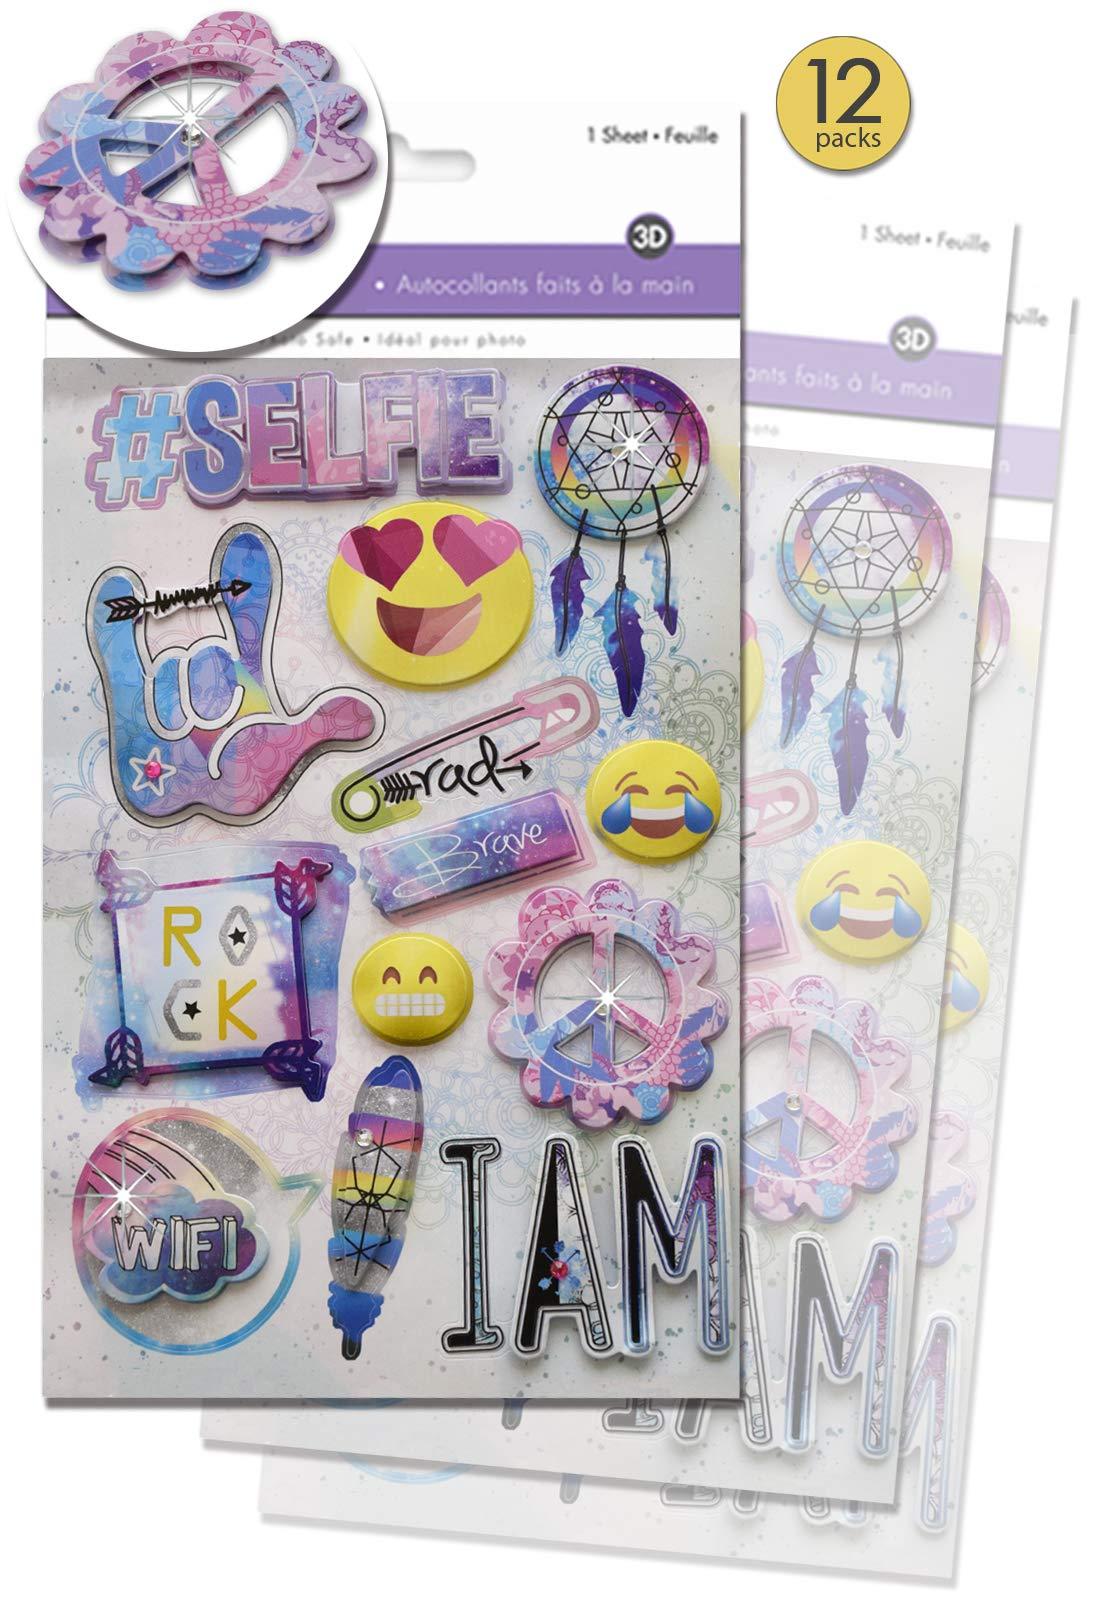 Girls Rock Scrapbook Bulk Value Pack Girls Rule 3D Stickers Best Friends Scrapbook 12 Pack Groovy Scrapbook Stickers BFF Scrapbook Stickers for Tweens Teen Girls Dimensional with Gem Accents